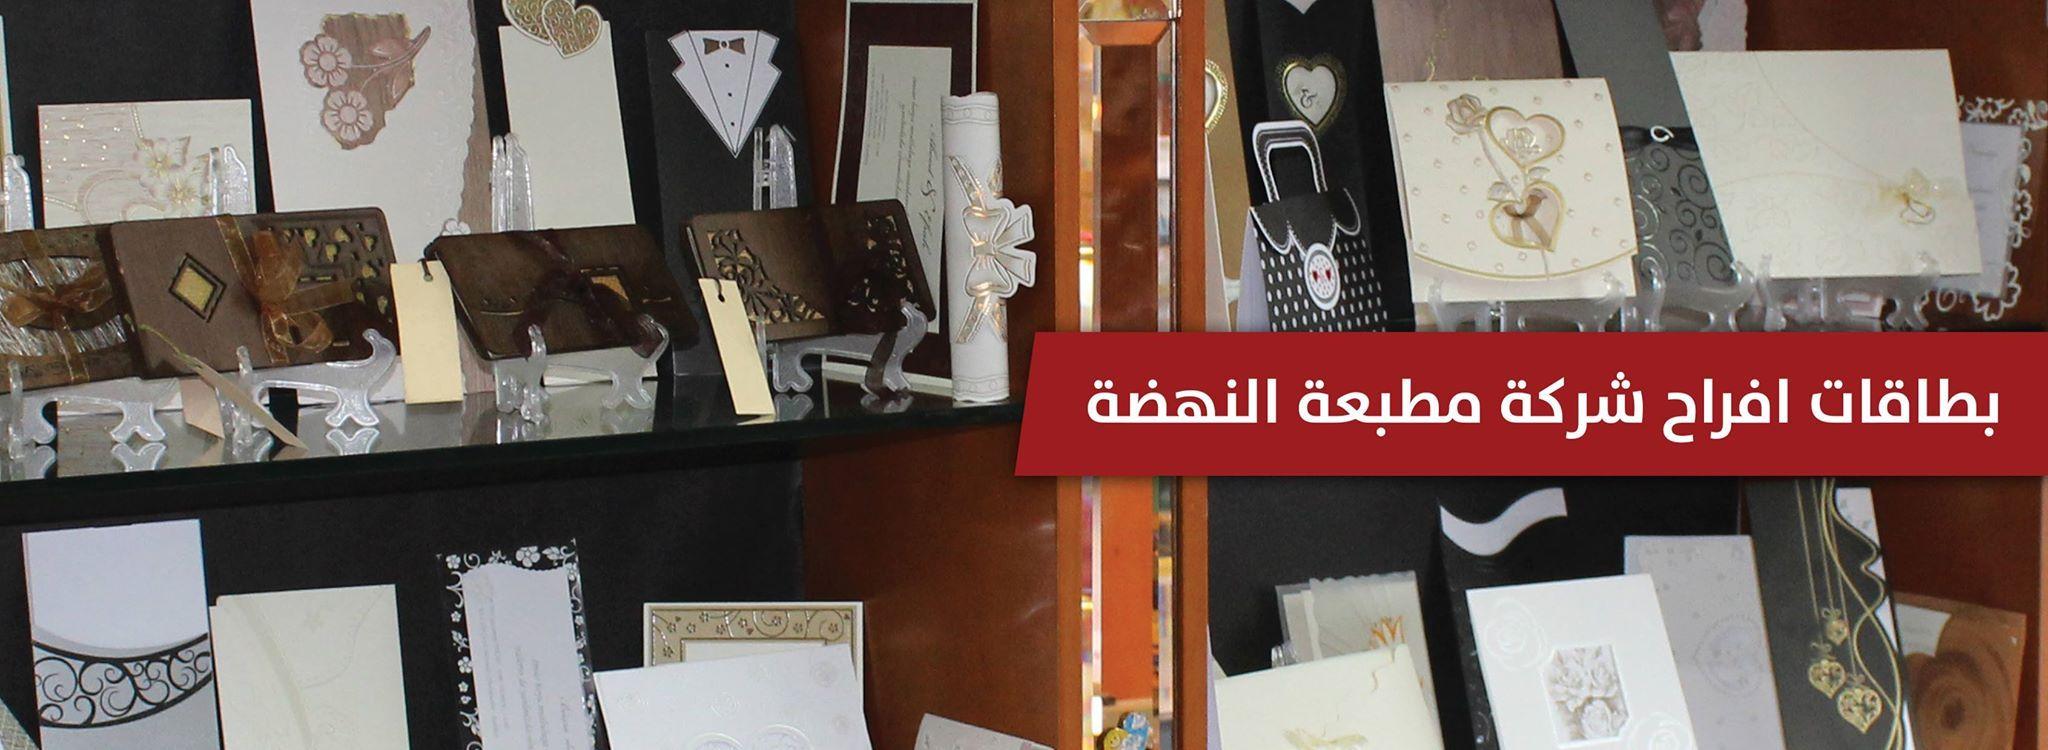 nahda company | wedding card invitation | Pinterest | Wedding card